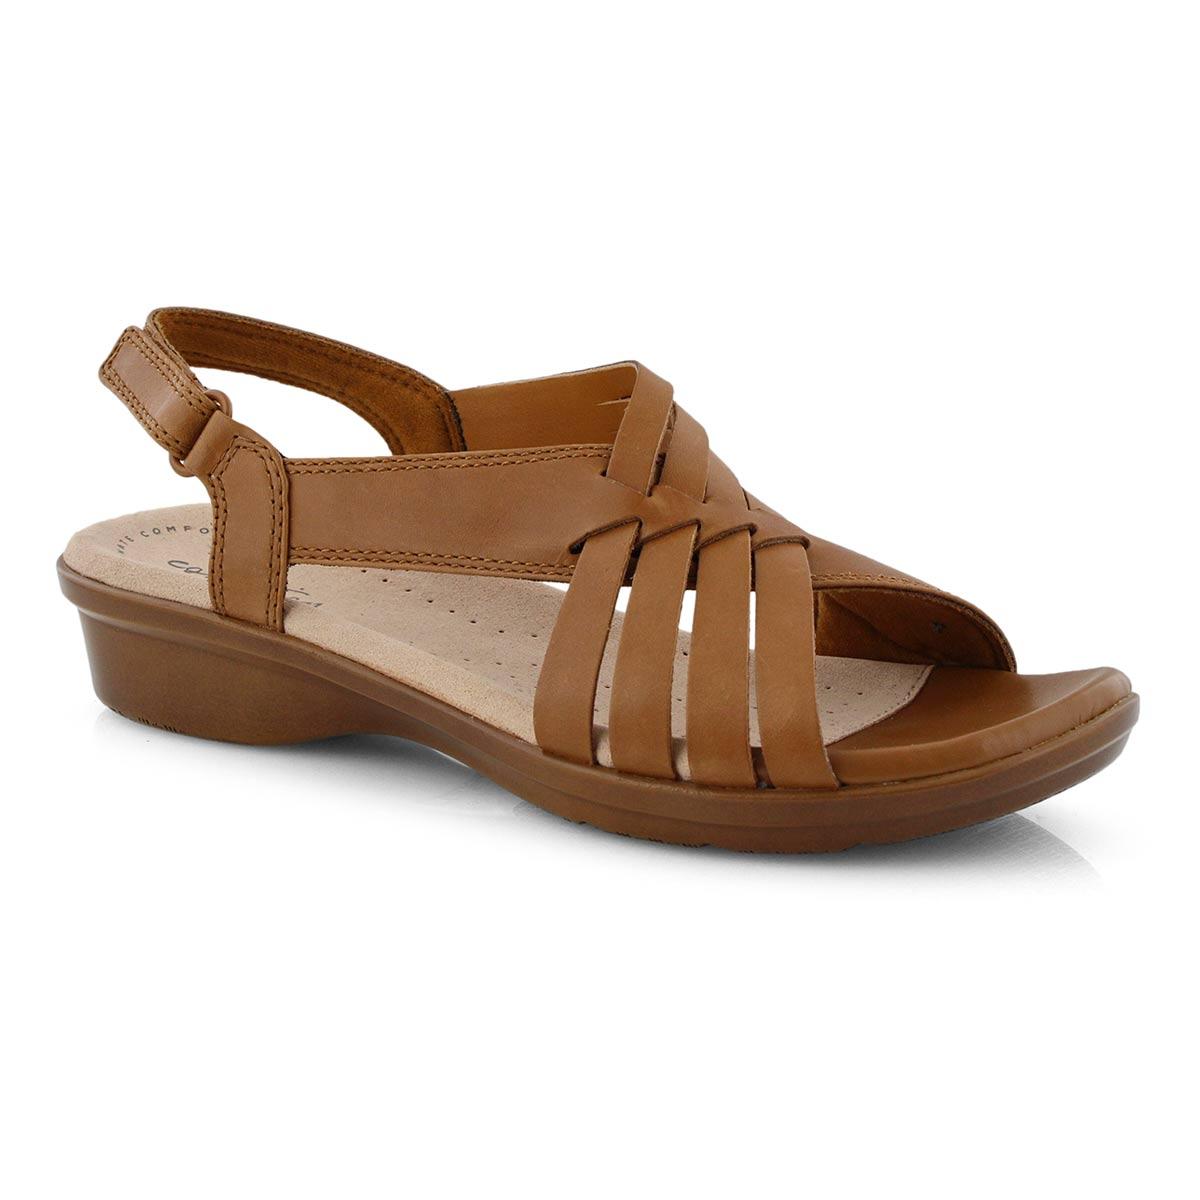 Lds Loomis Cassey tan casual sandal